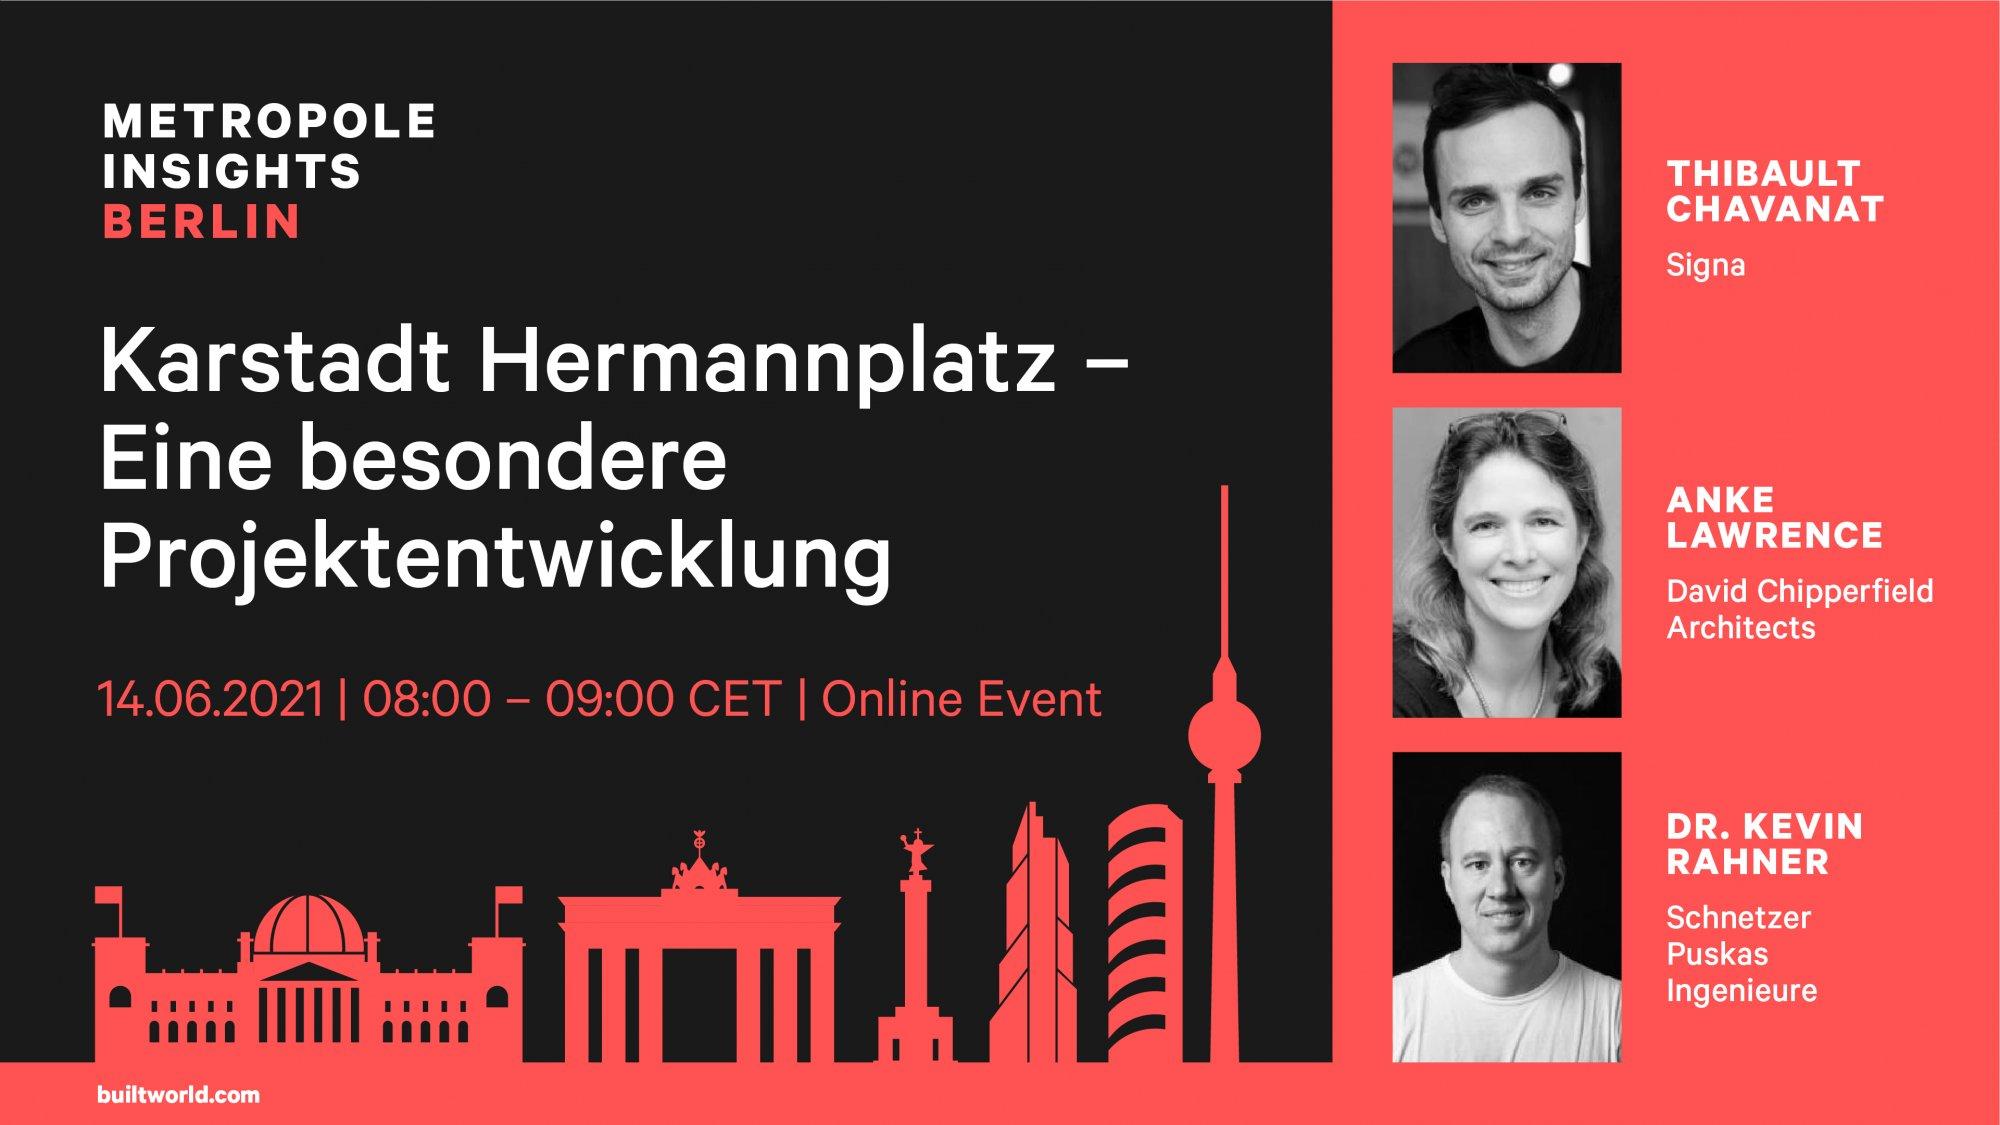 metropole-insights-berlin-karstadt-hermannplatz